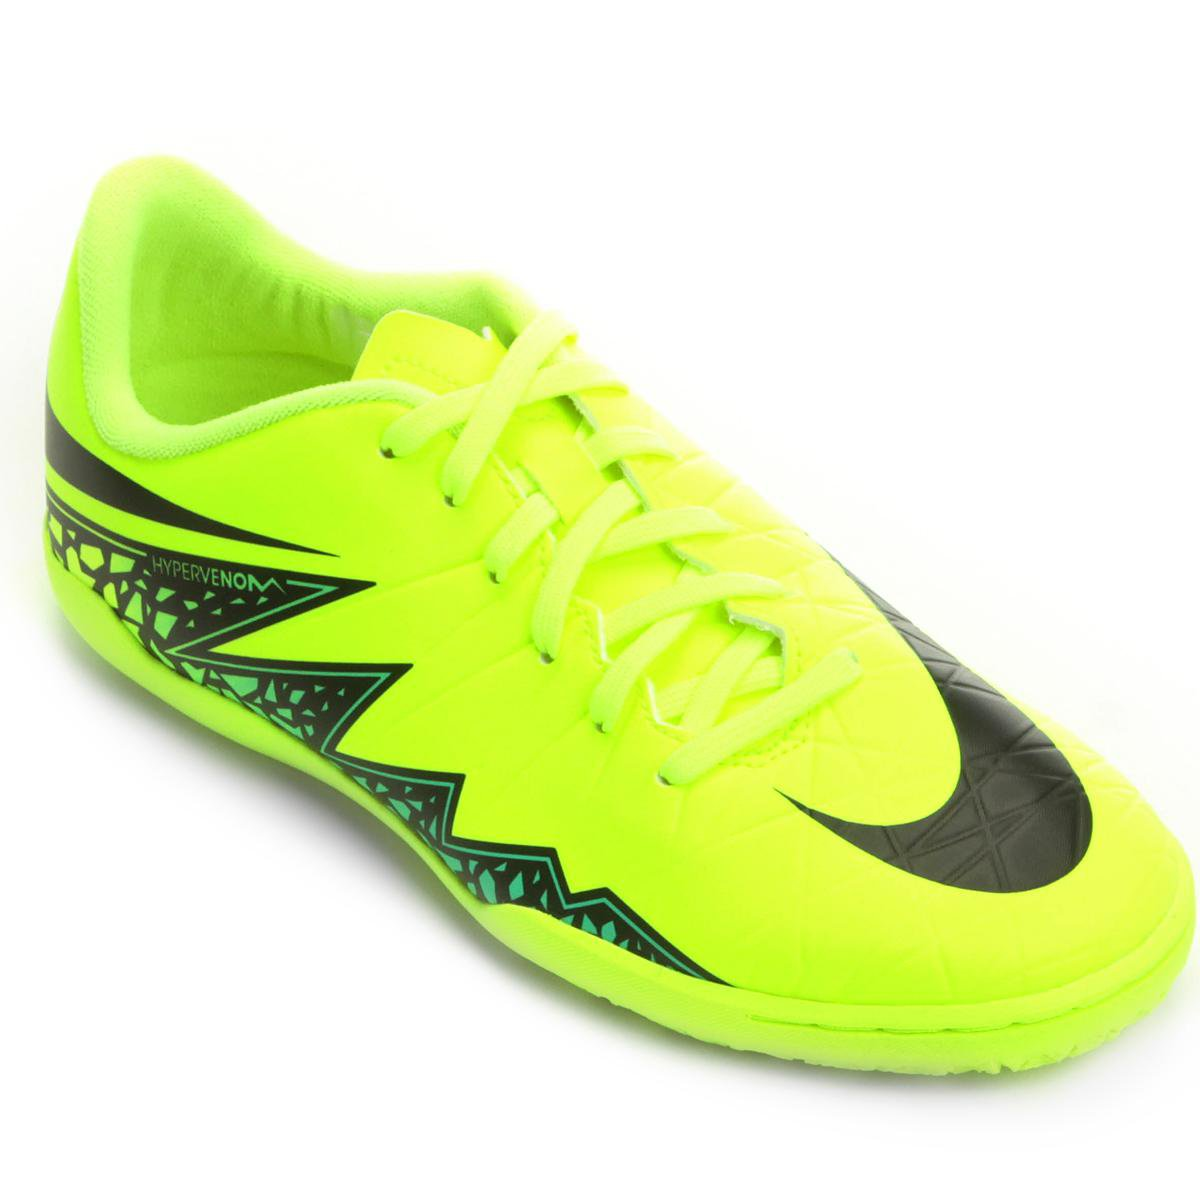 8e7504748e Chuteira Futsal Infantil Nike Hypervenom Phelon 2 IC - Compre Agora ...